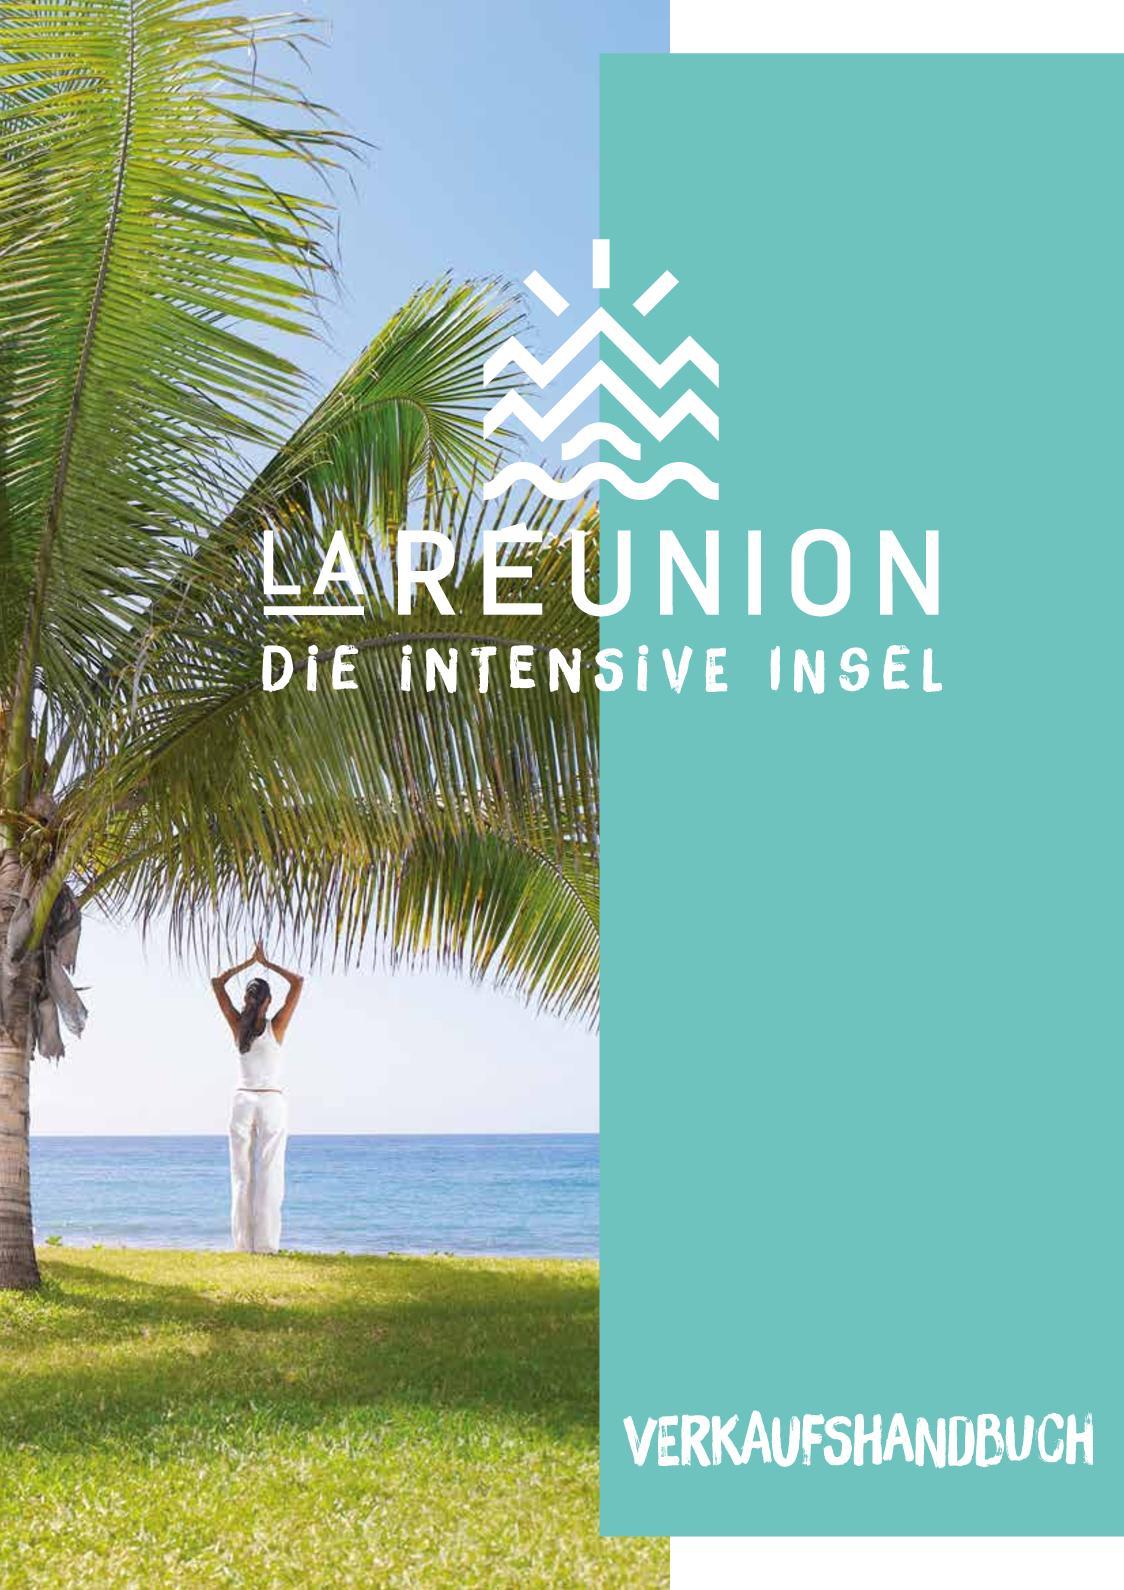 Calameo Verkaufshandbuch La Reunion 2019 2020